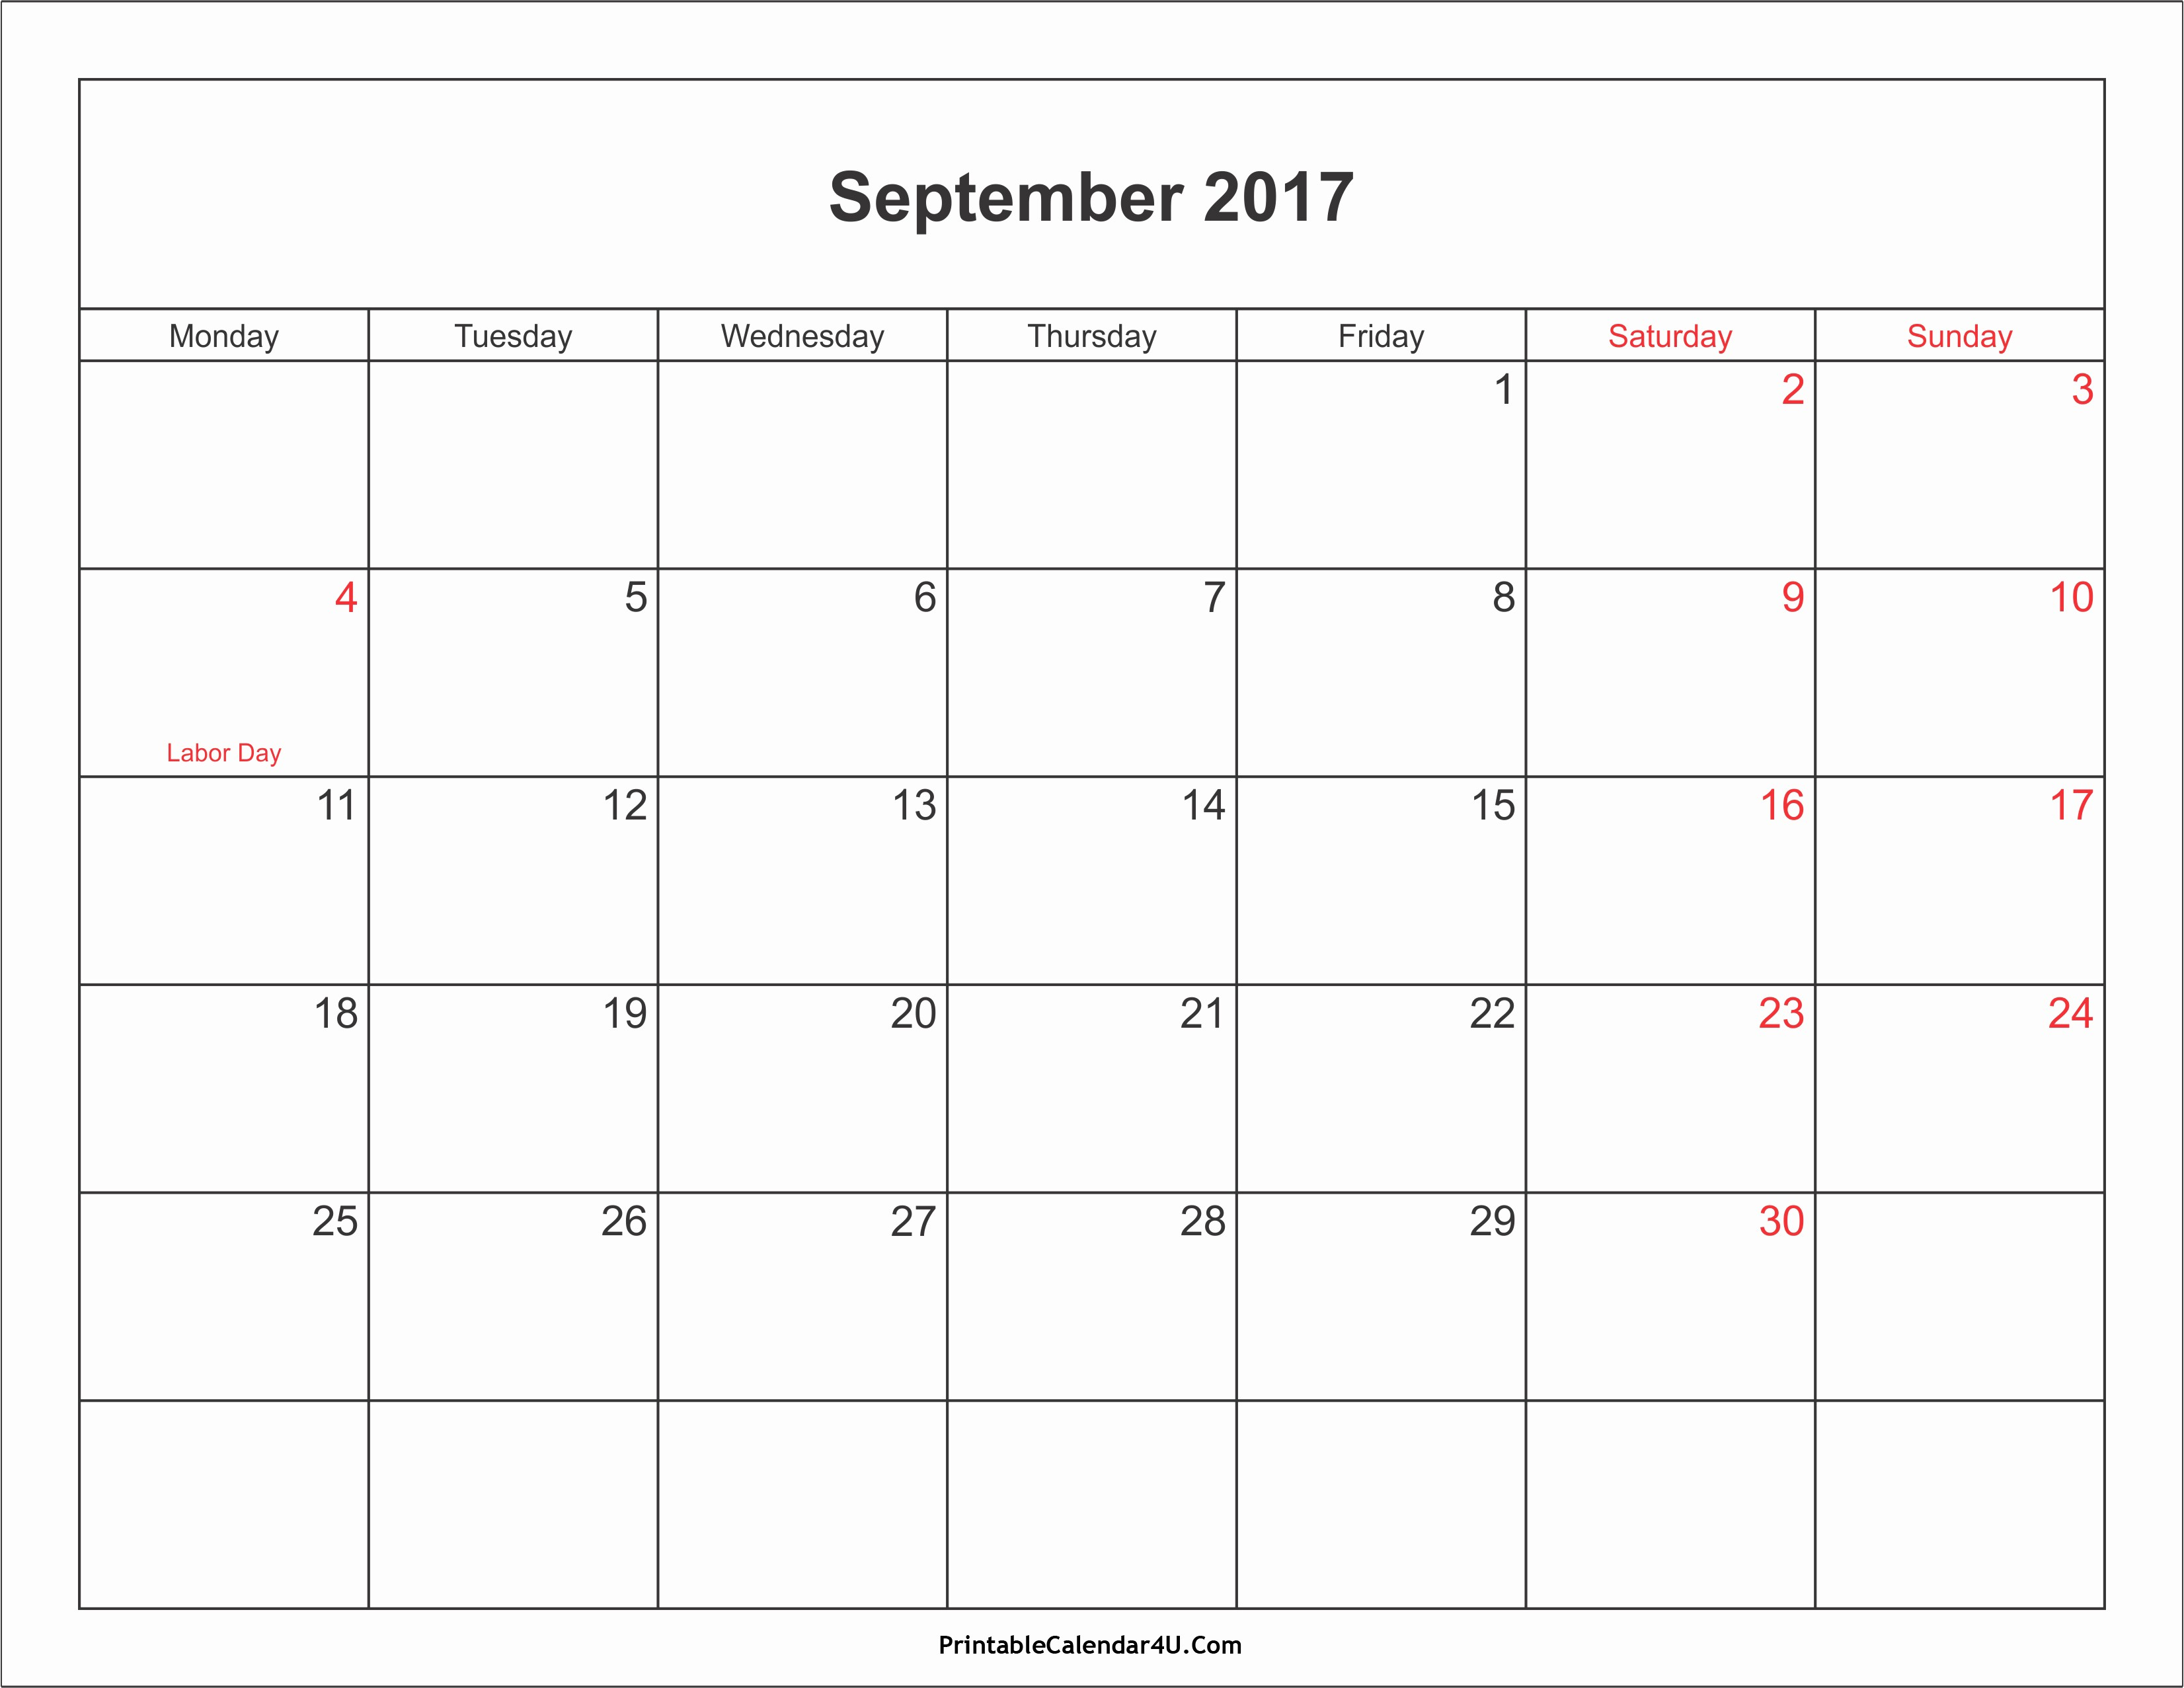 September 2017 Printable Calendar Word New September 2017 Calendar Pdf